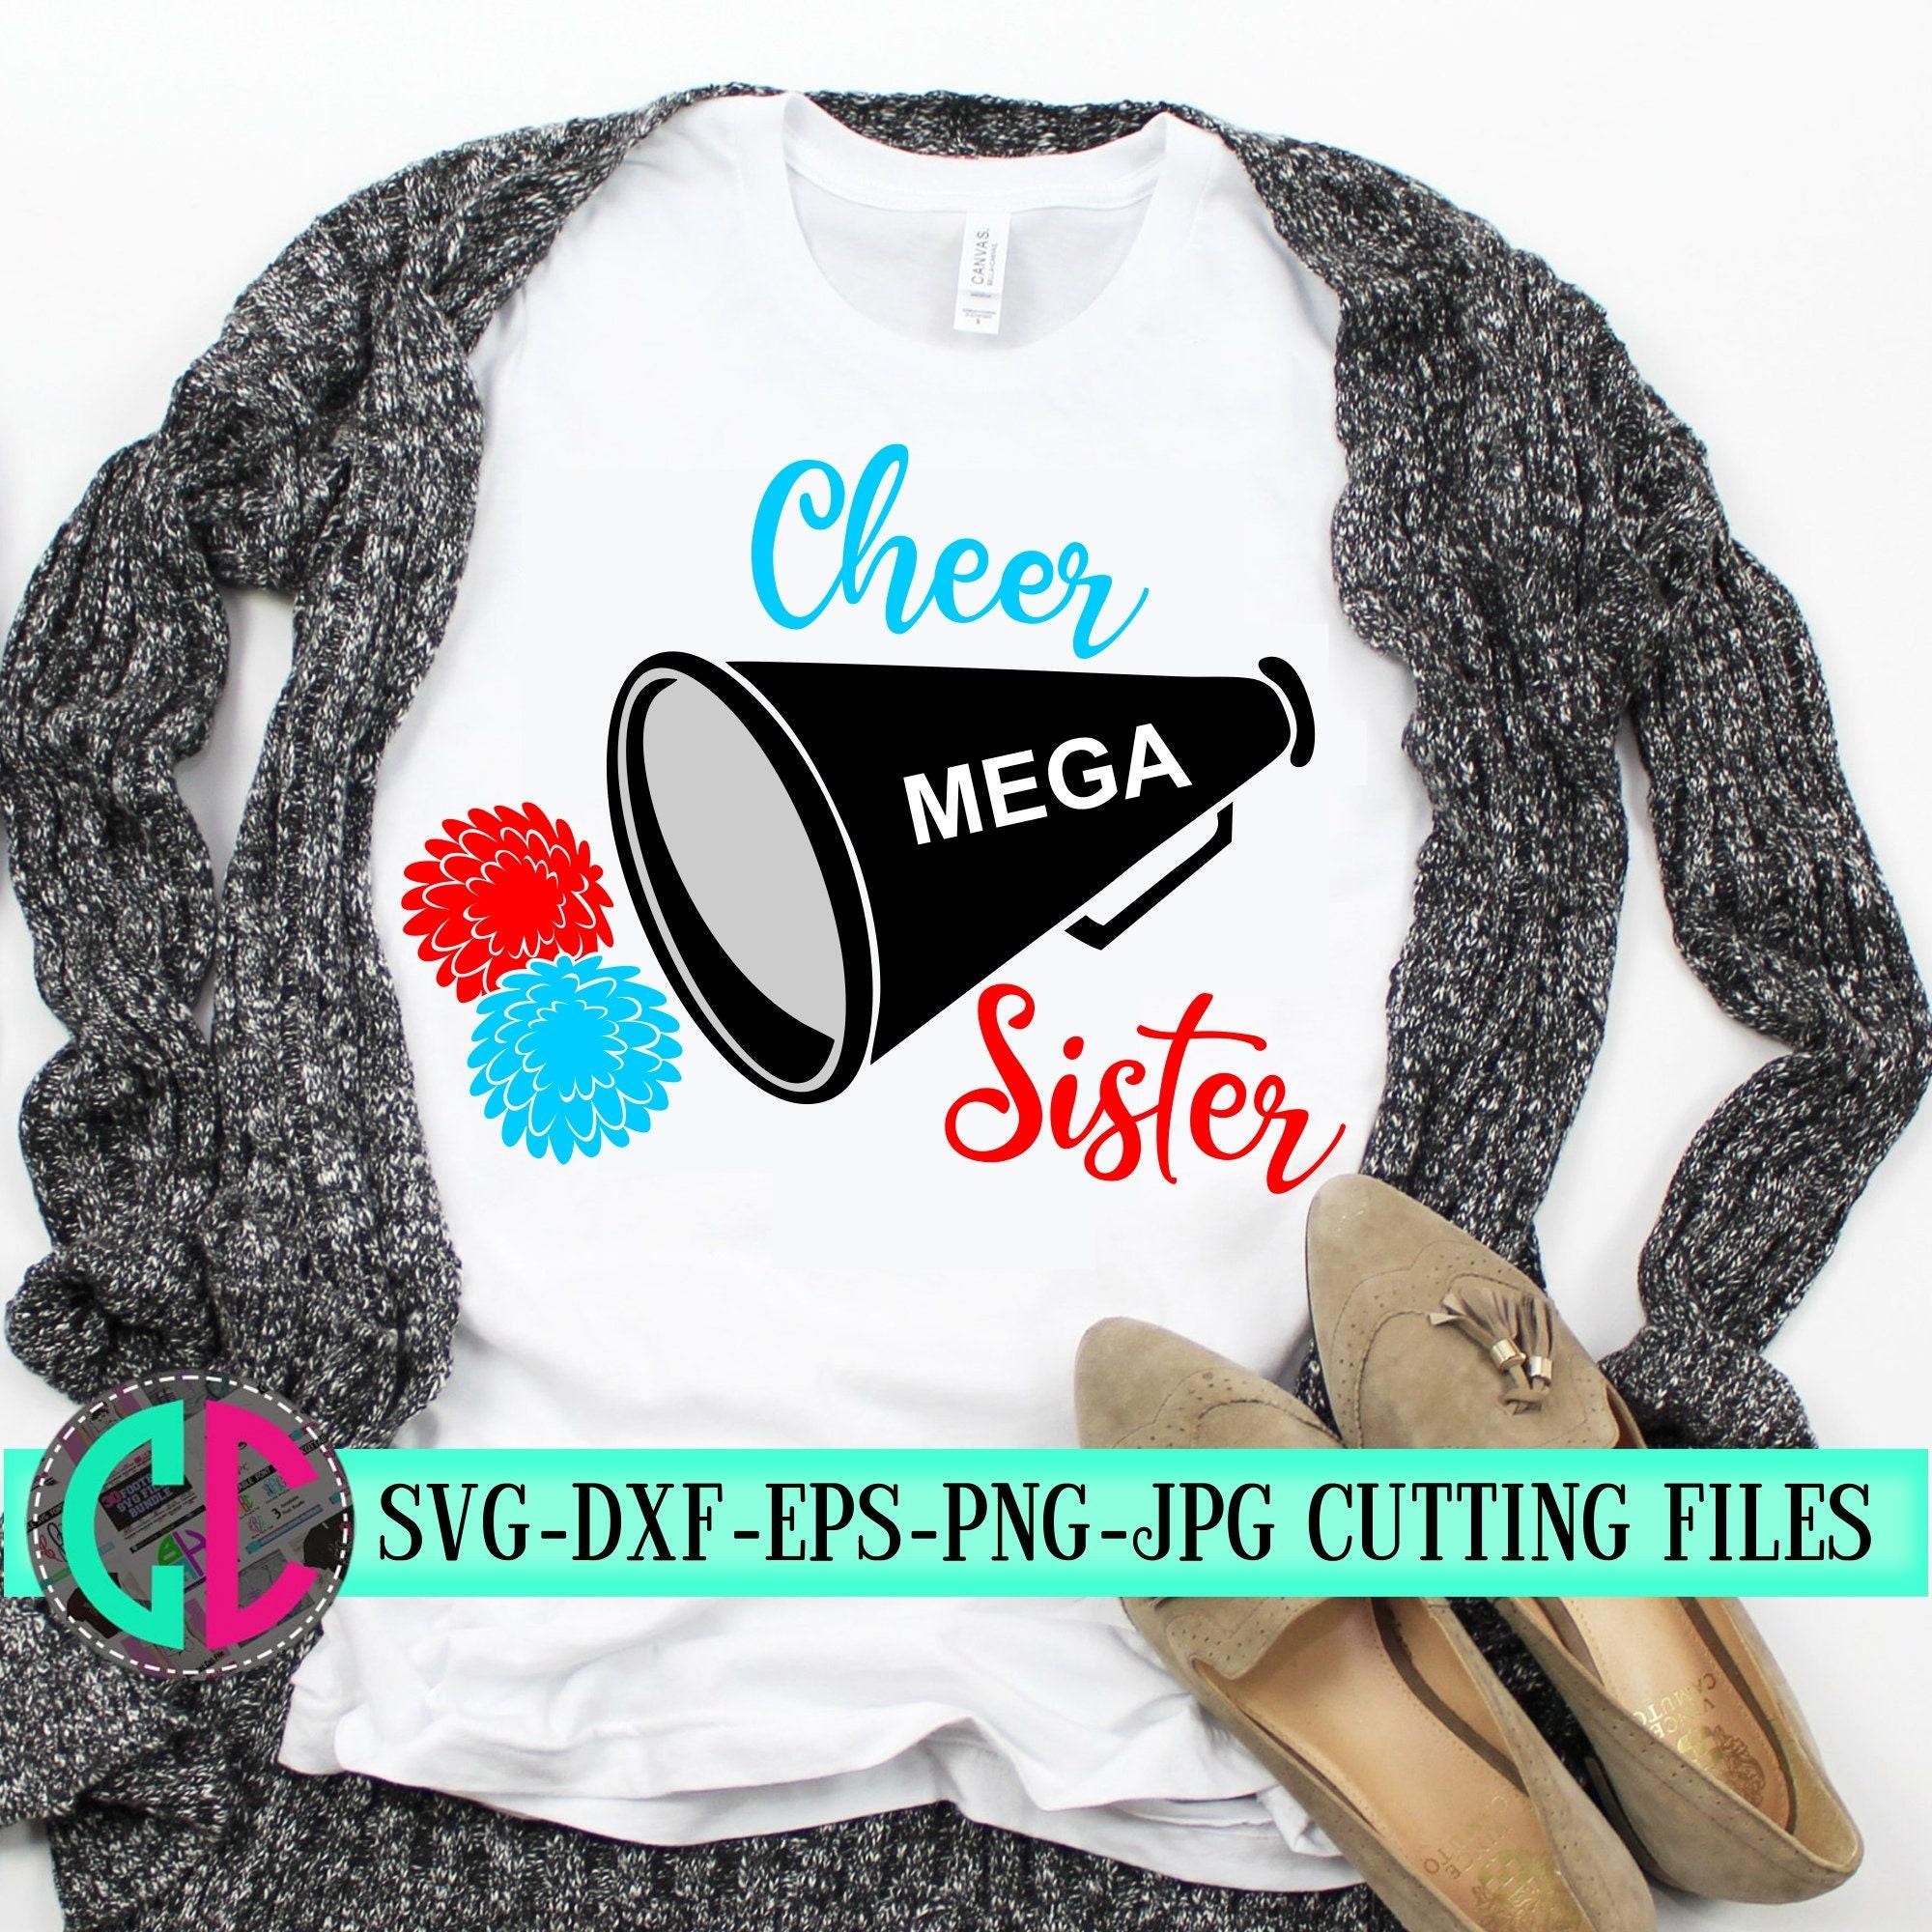 Cheer Sister Megaphone Svg Cheerleader Sister Svg Cheerleader Svg Football Svg Cheerleader Cut File Cheer Sister Svg Svg For Cricut